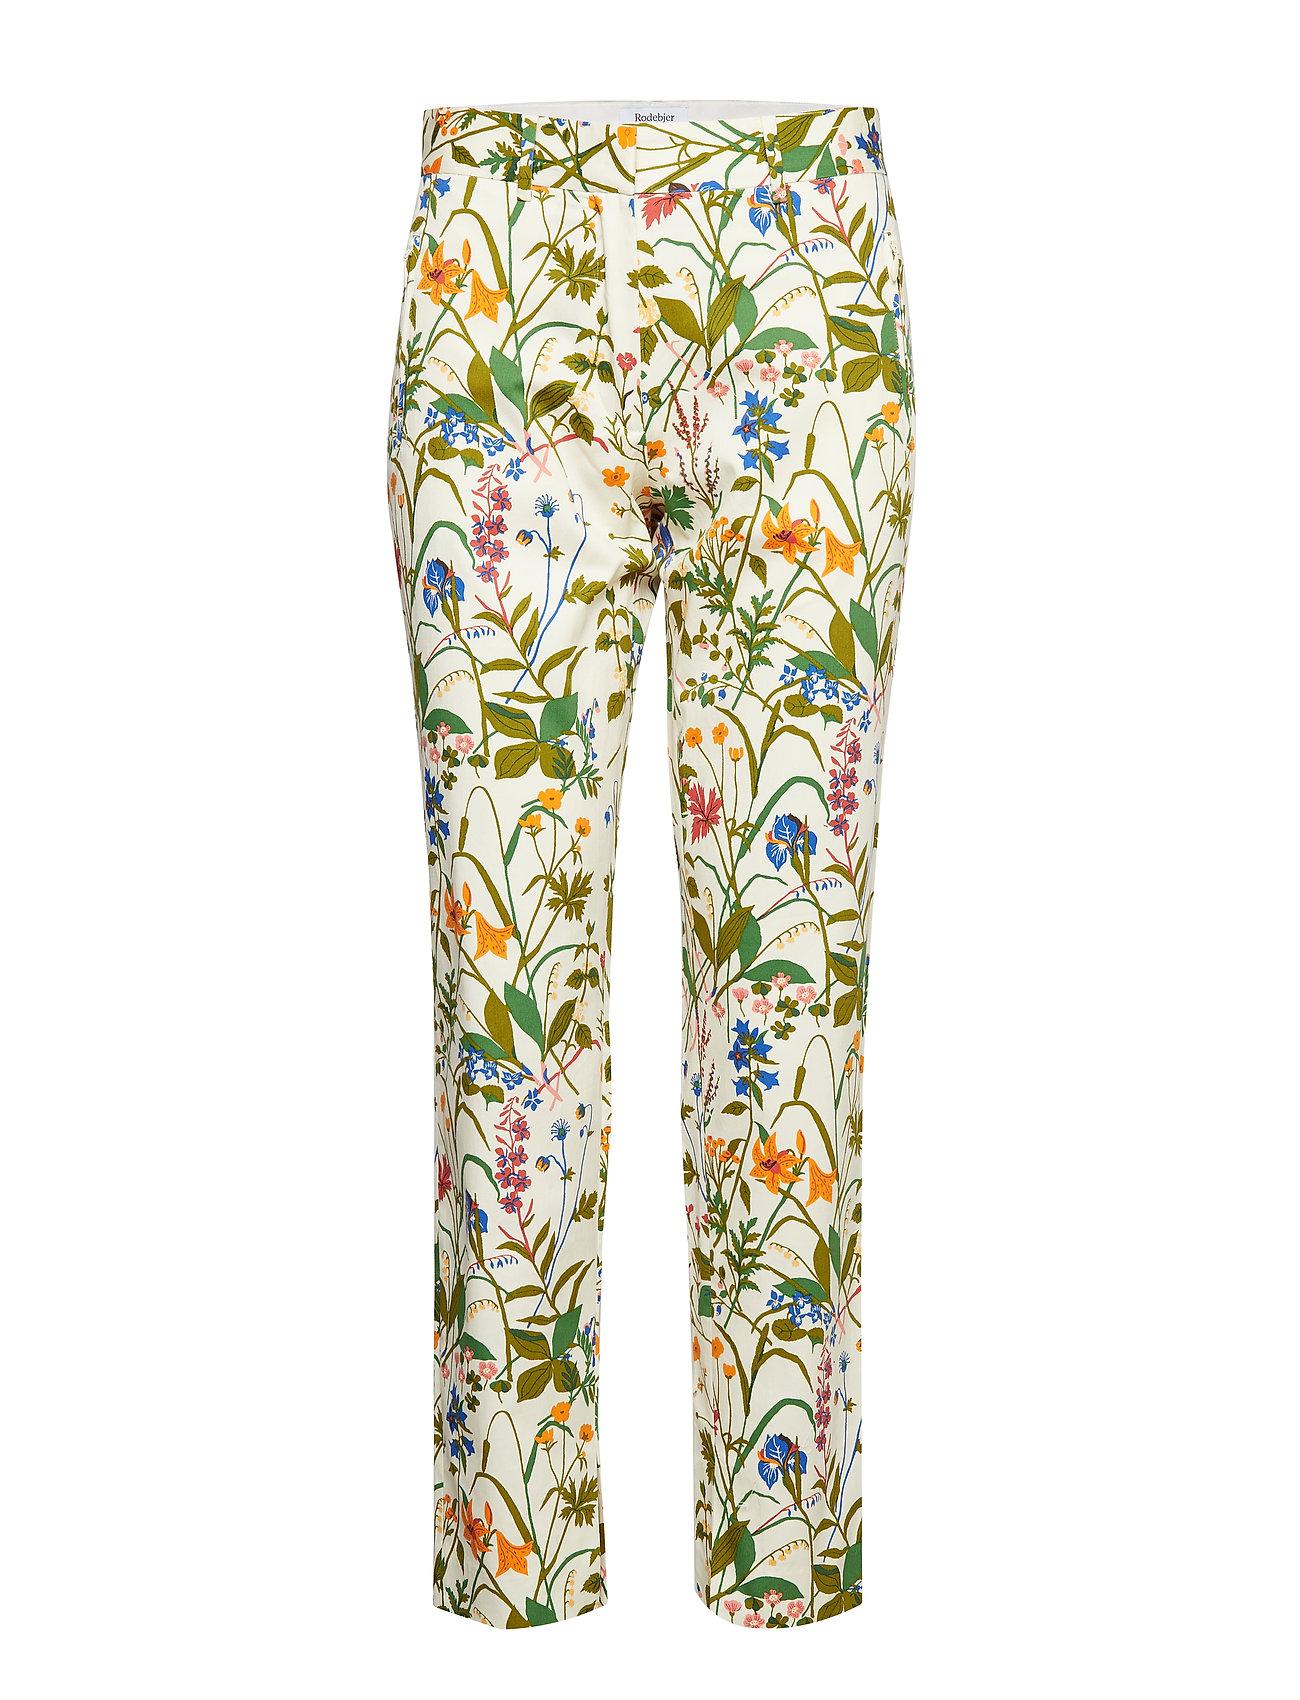 Image of Paloma Twill Smalle Bukser Skinny Pants Multi/mønstret RODEBJER (3406173507)